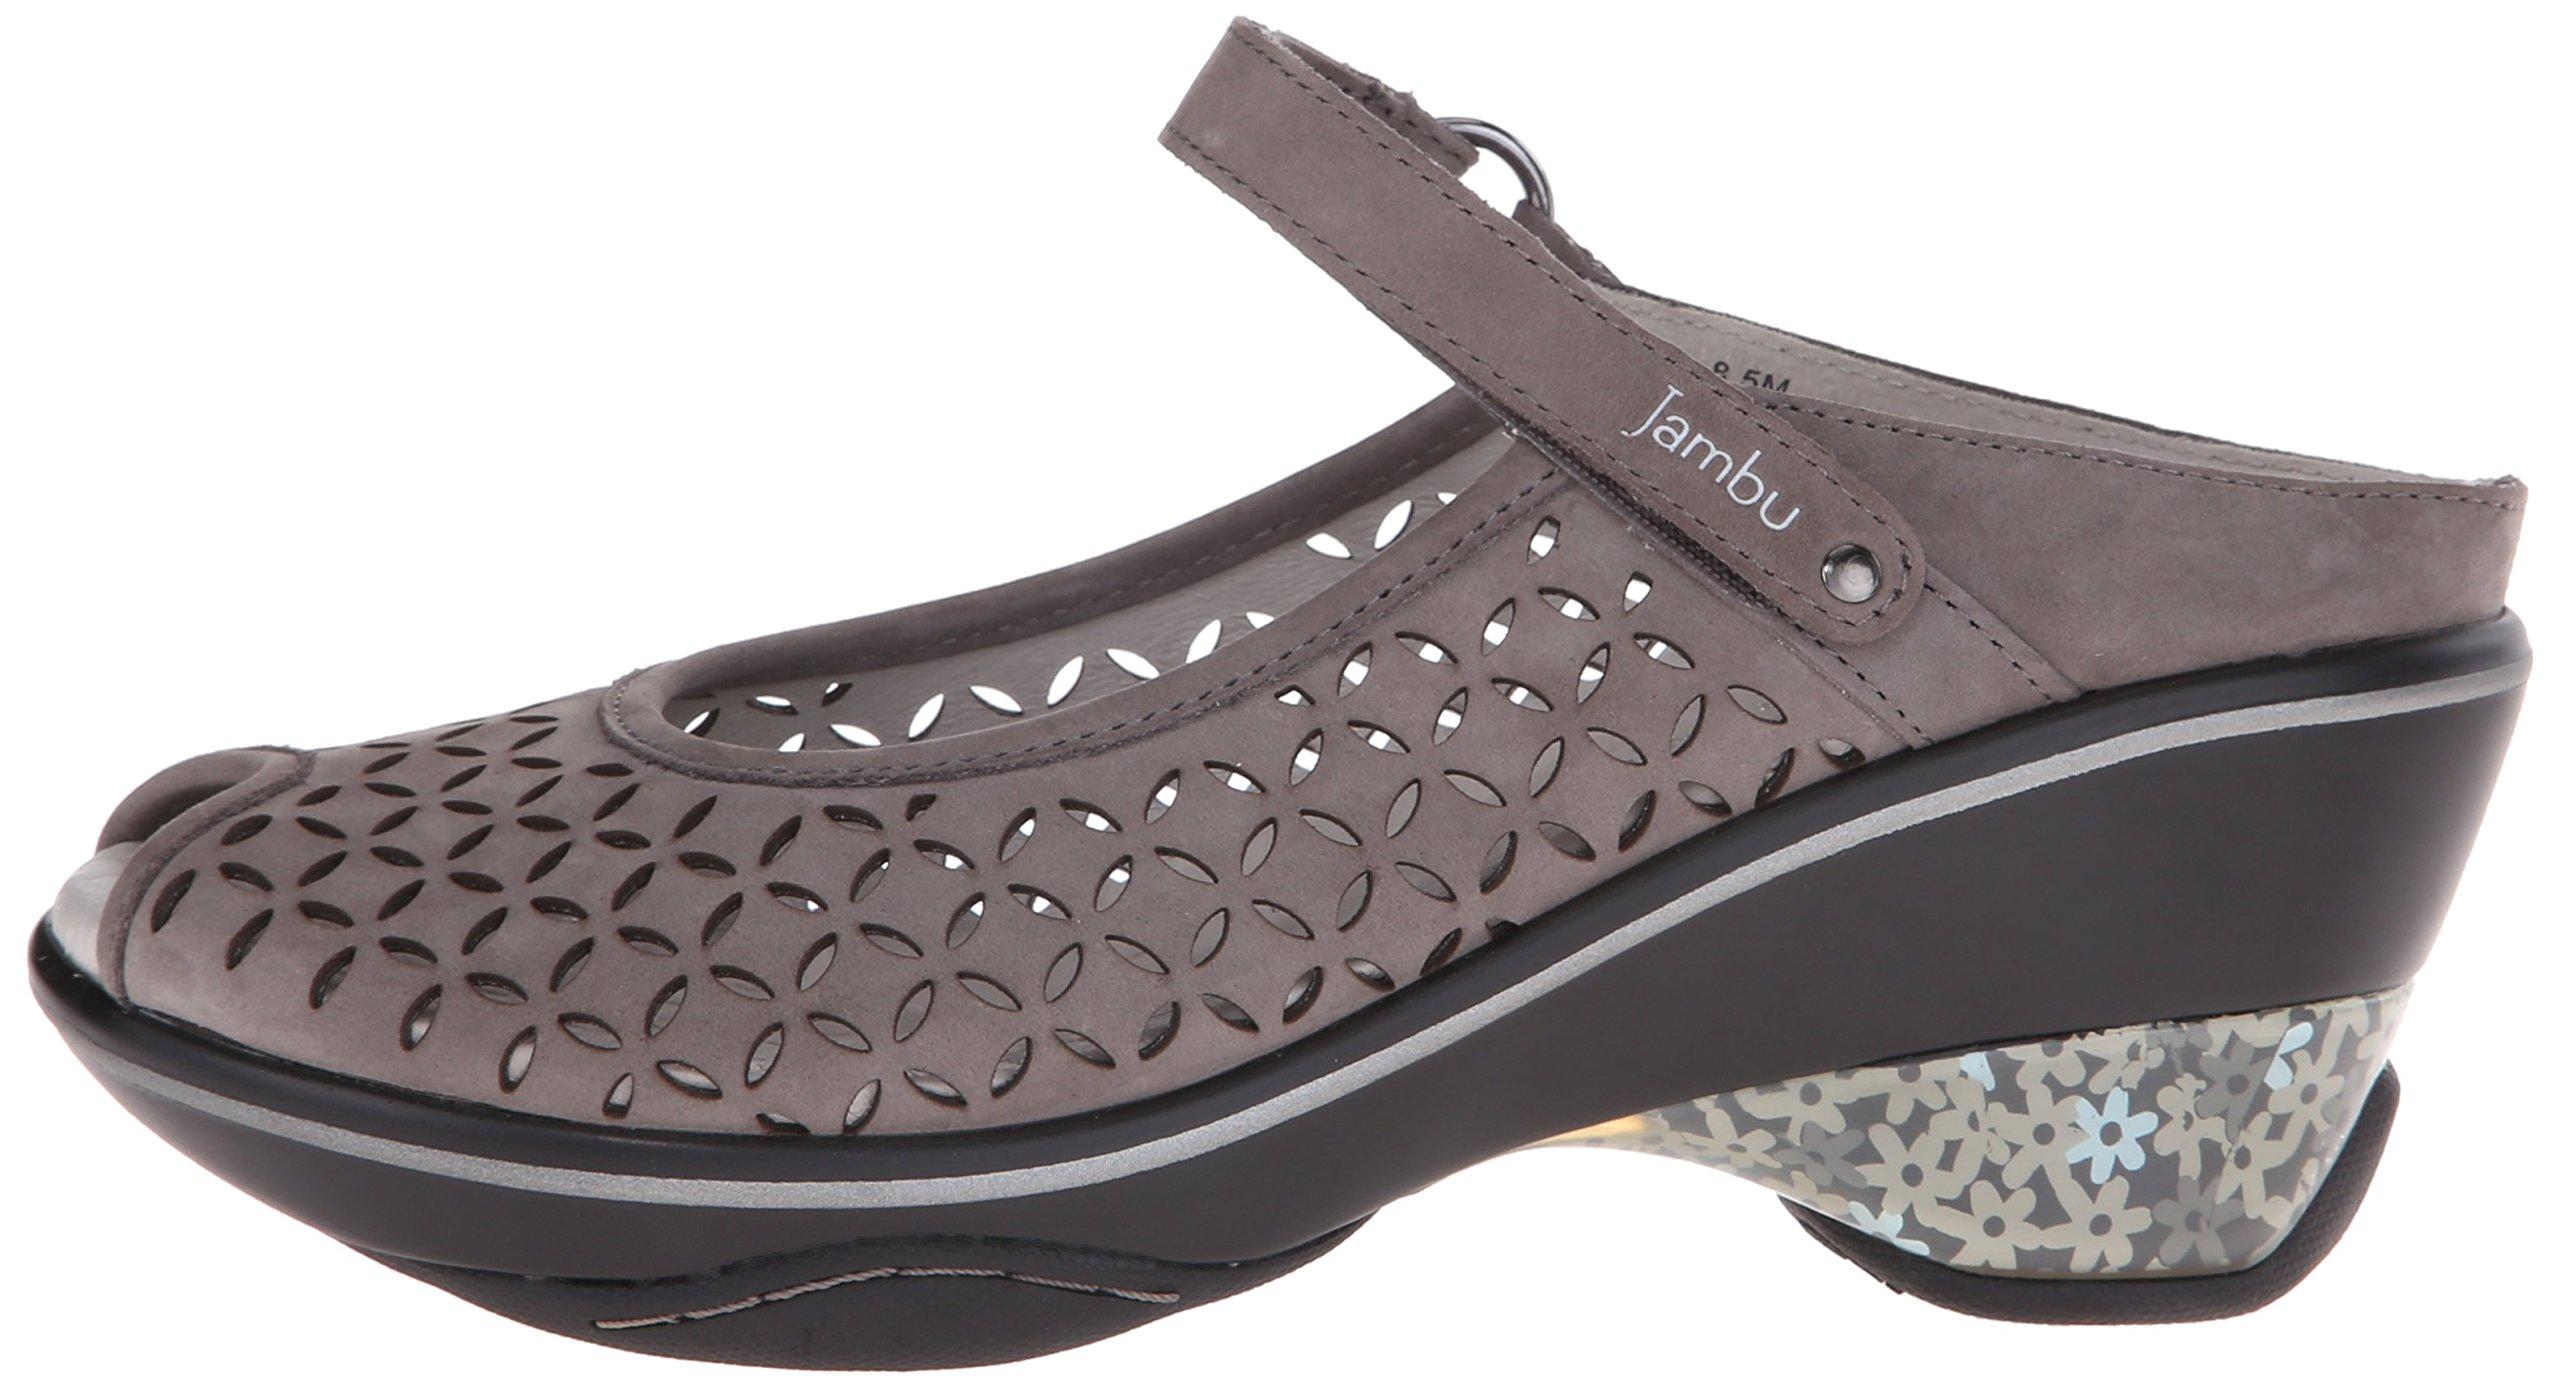 Jambu Women's Journey Encore Wedge Sandal, Dark Grey, 10 M US by Jambu (Image #5)